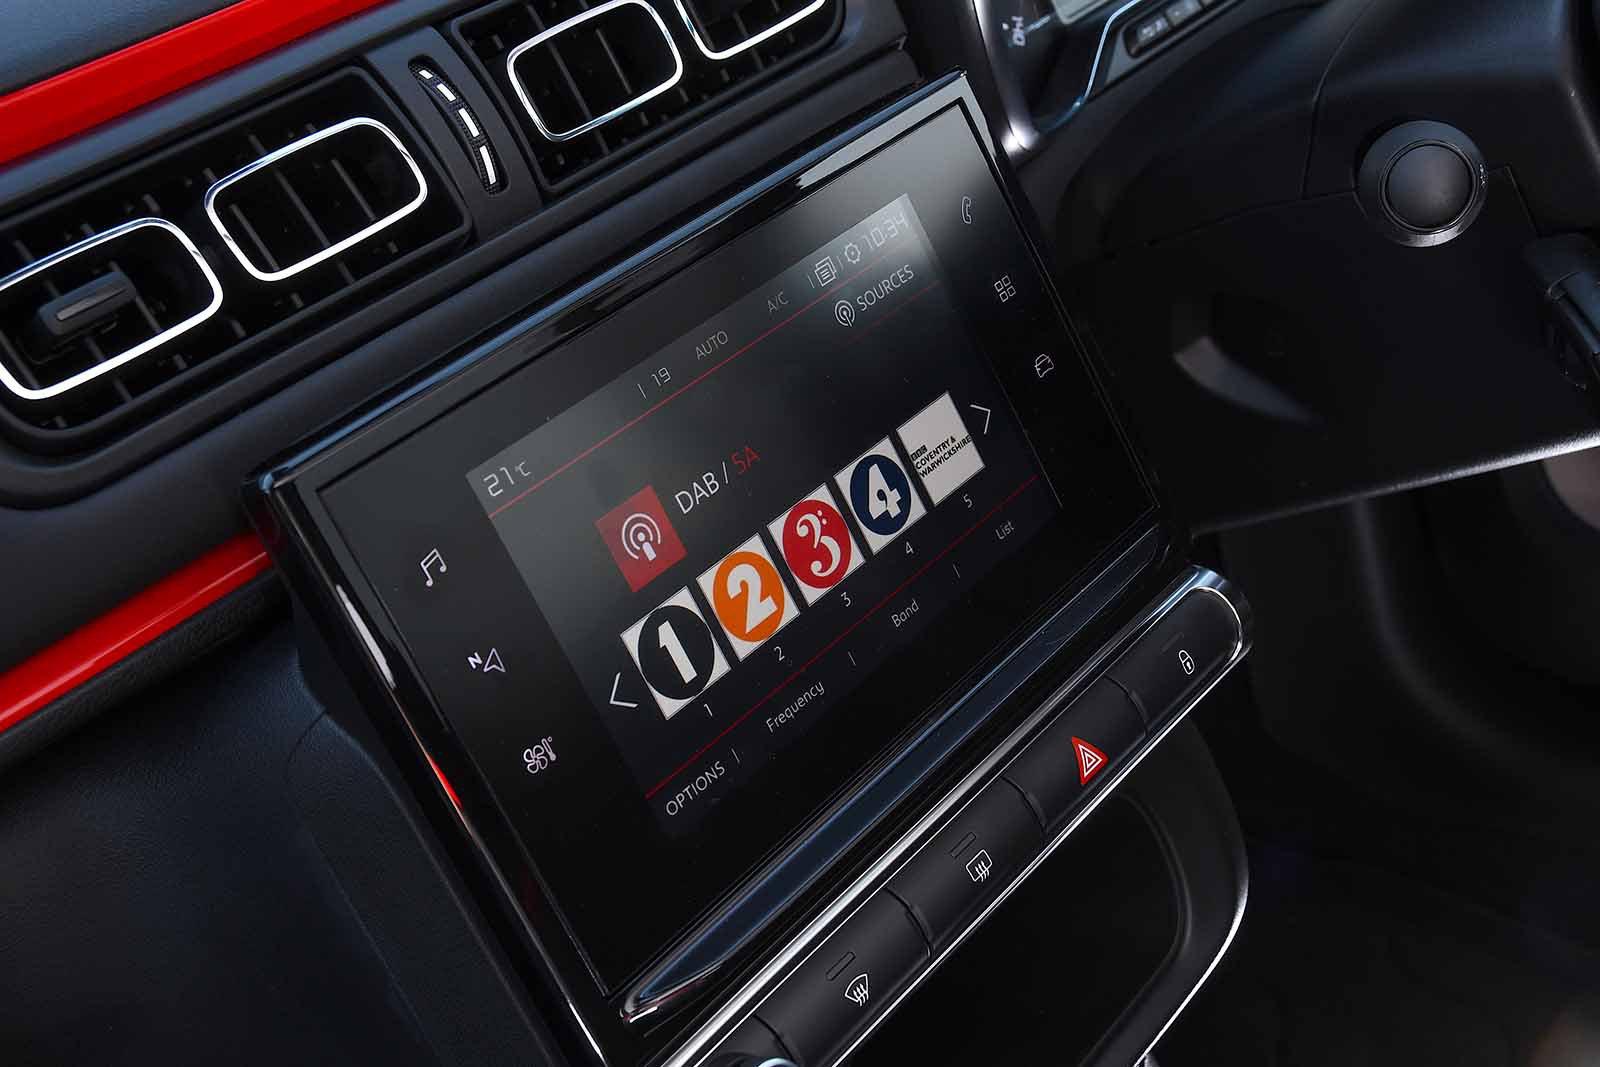 Citroen C3 2019 RHD infotainment